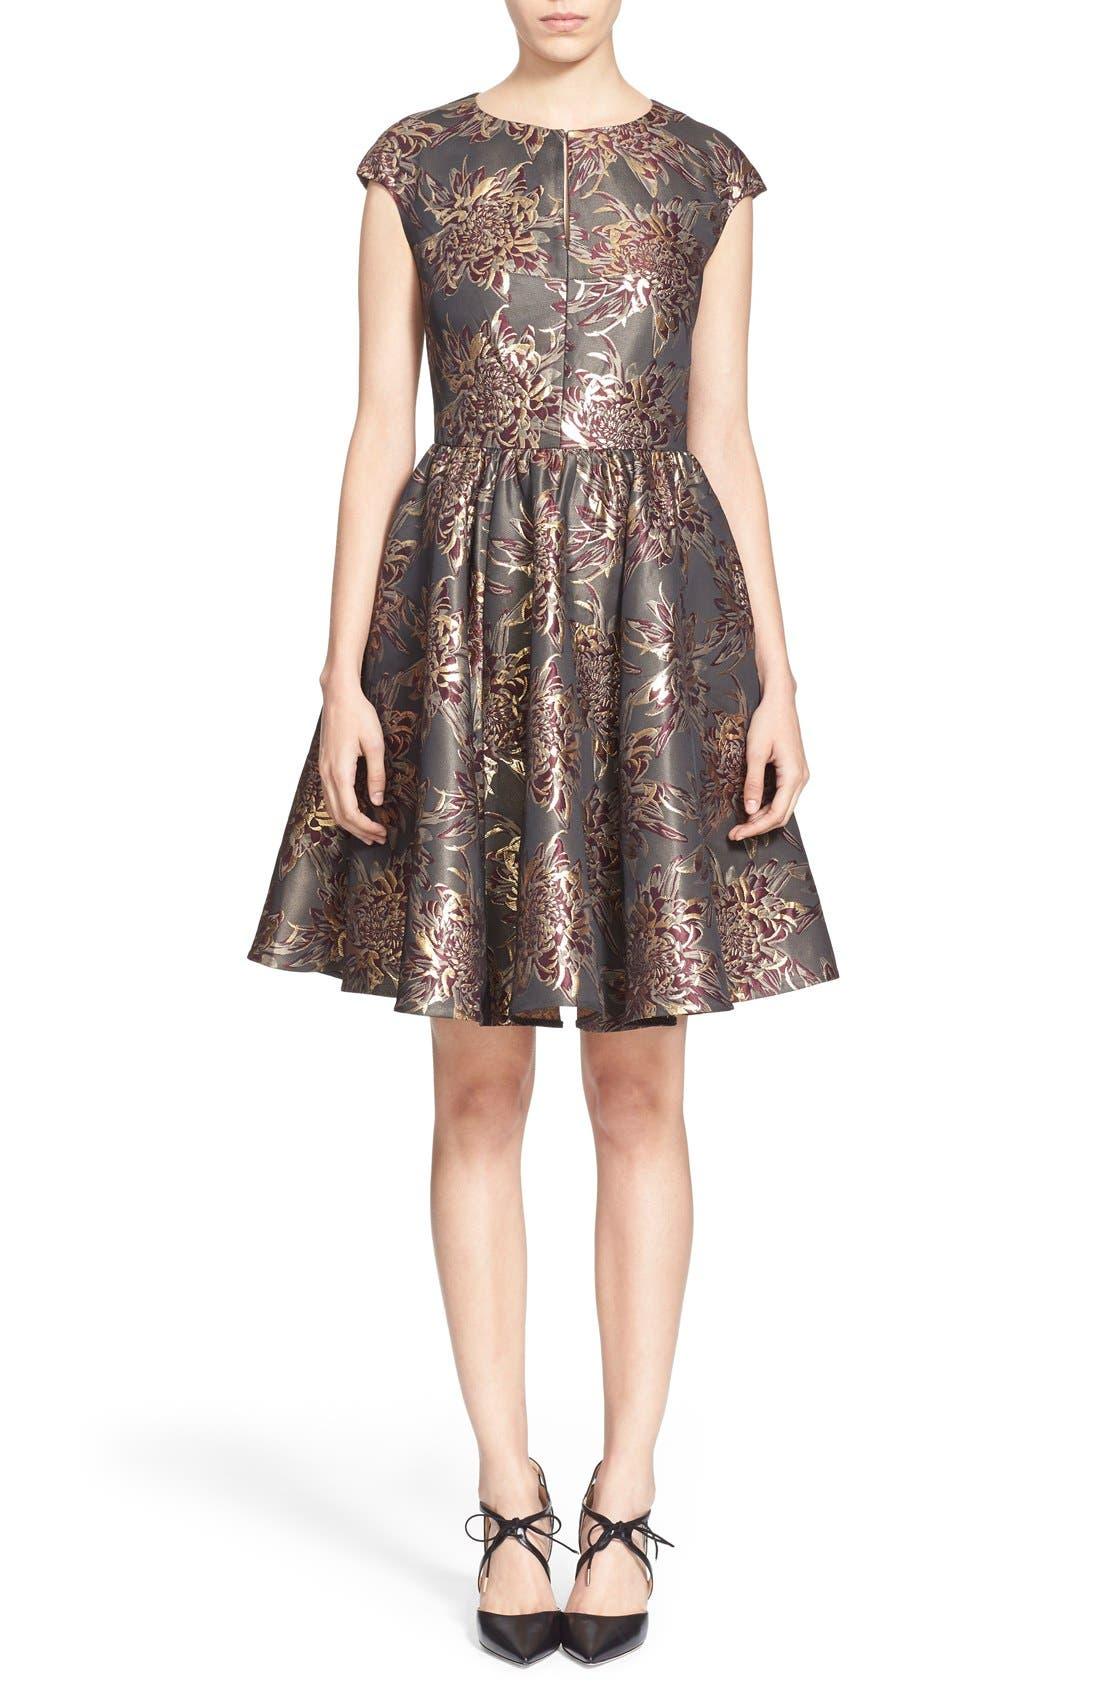 Main Image - Ted Baker London 'Laurey' Metallic Floral Jacquard Fit & Flare Dress